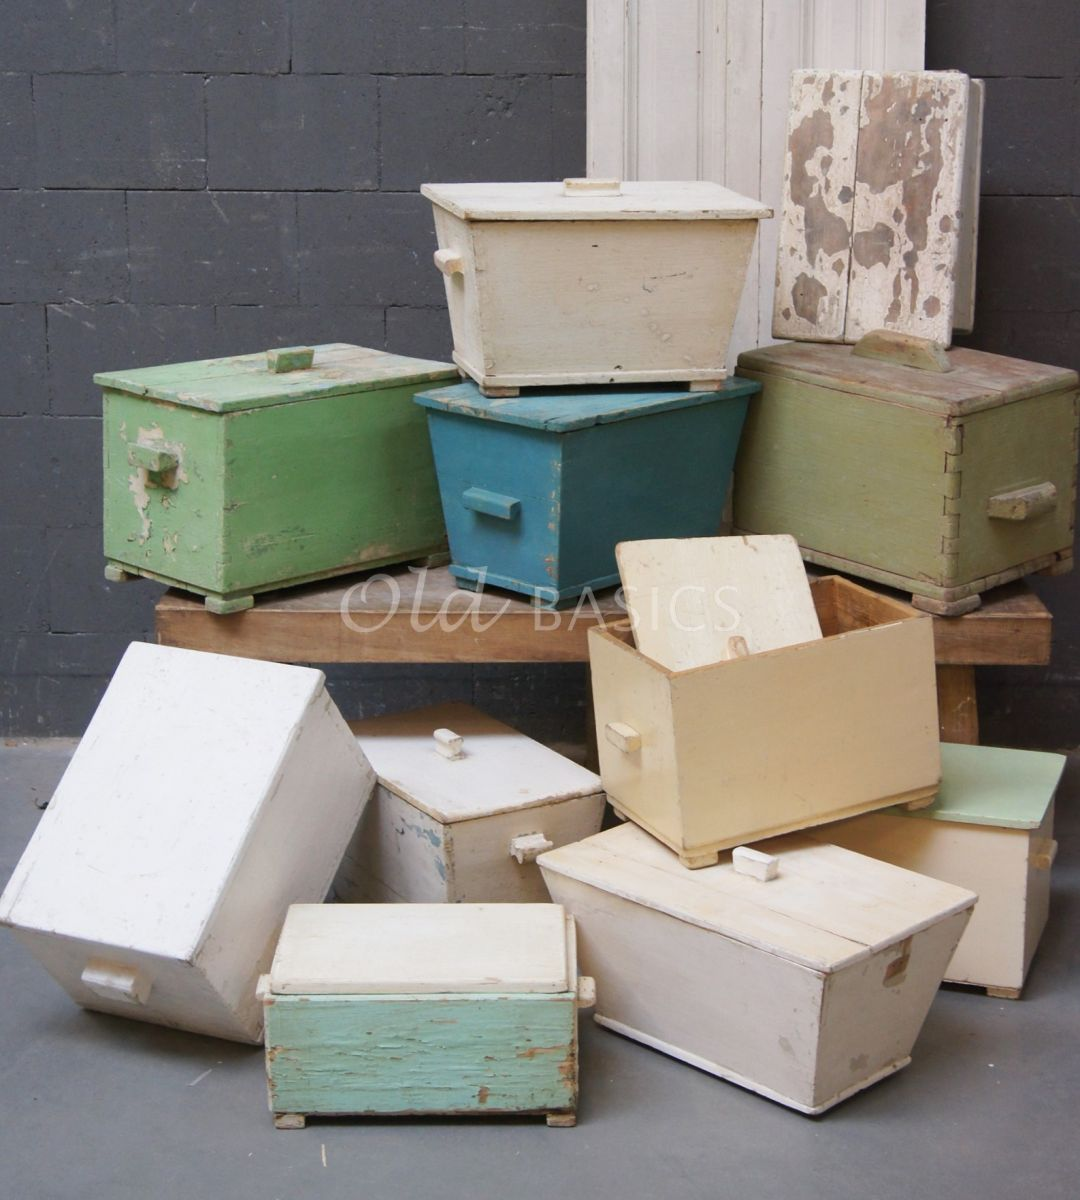 Kist, materiaal hout